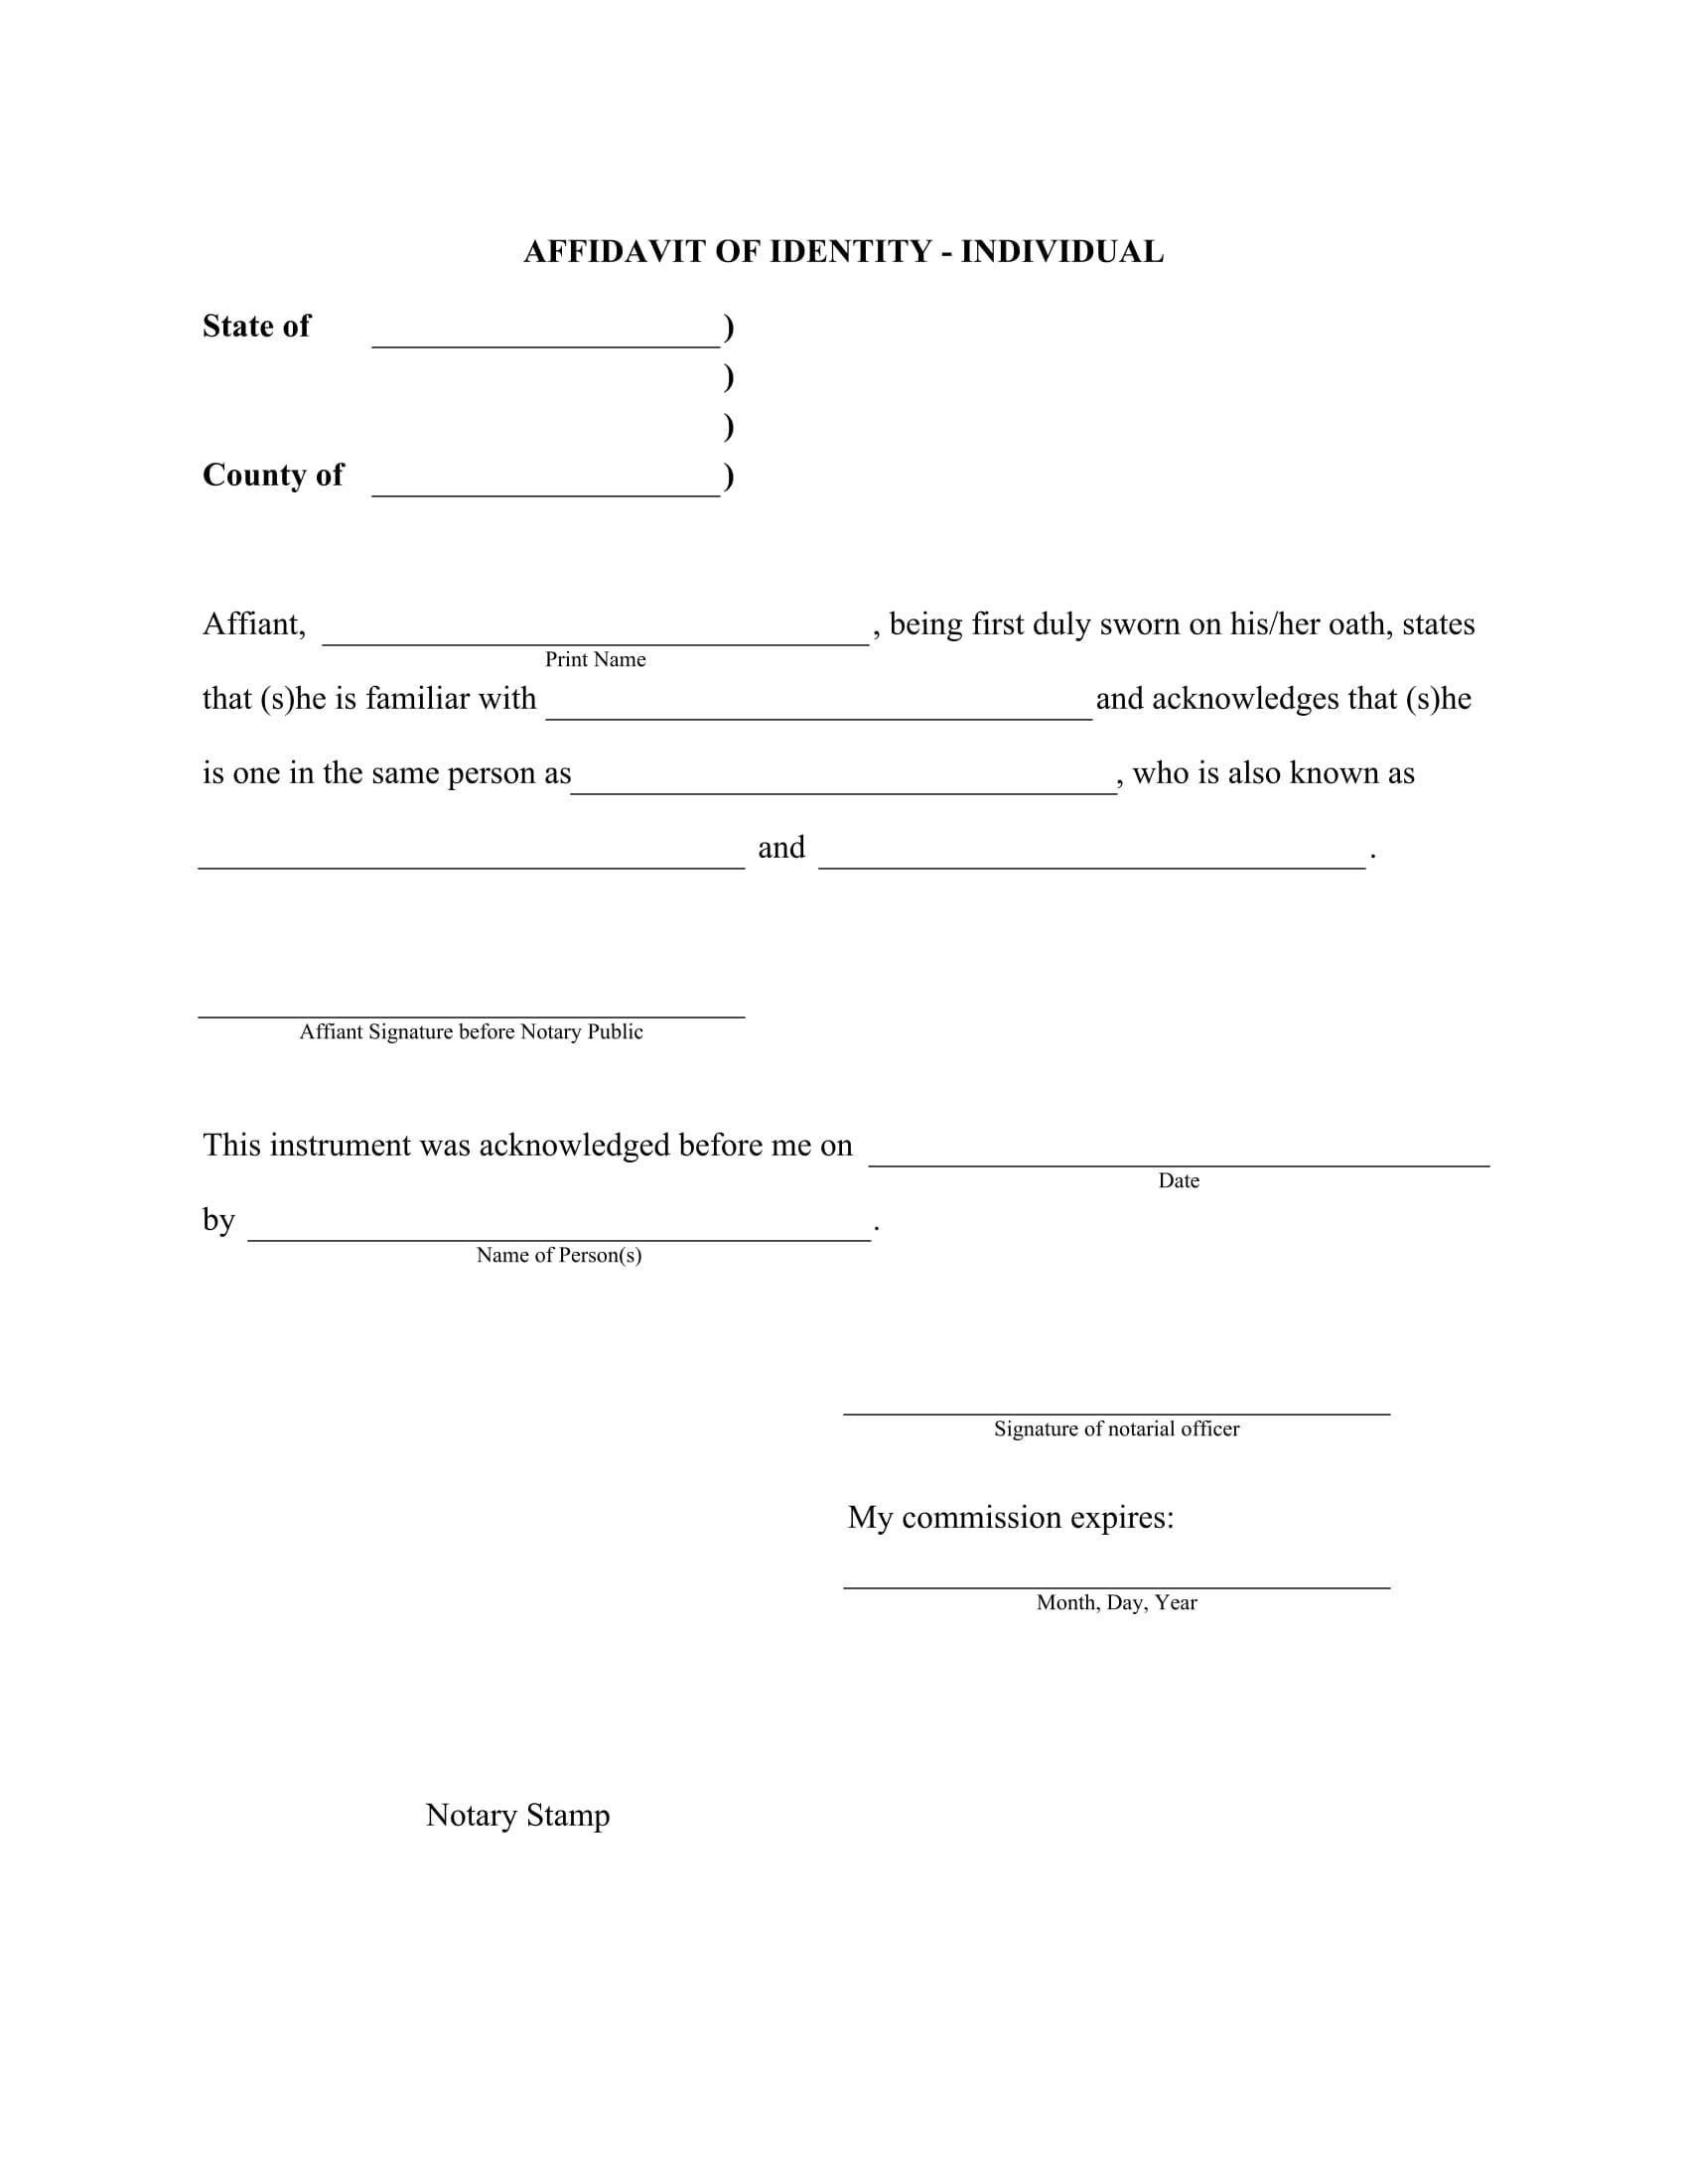 FREE 8+ Affidavit of Identity Forms in PDF